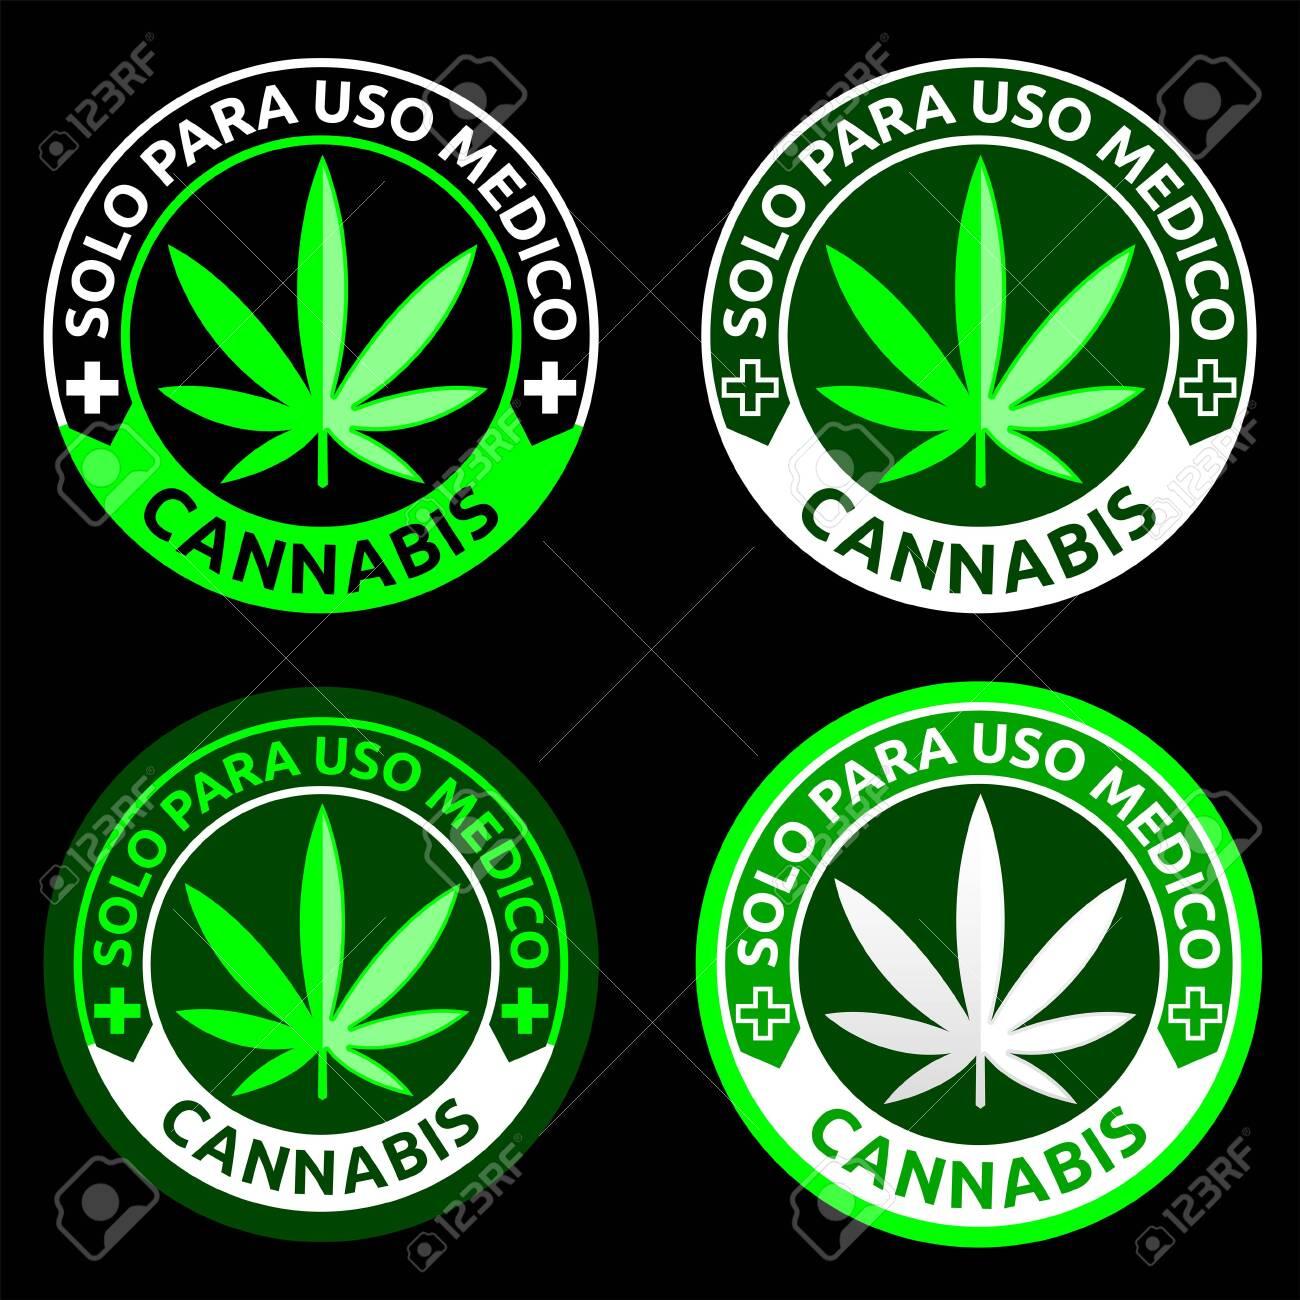 Cannabis, Solo para uso Medico, Only for Medical use spanish text, Medical Marijuana emblem. - 142922845